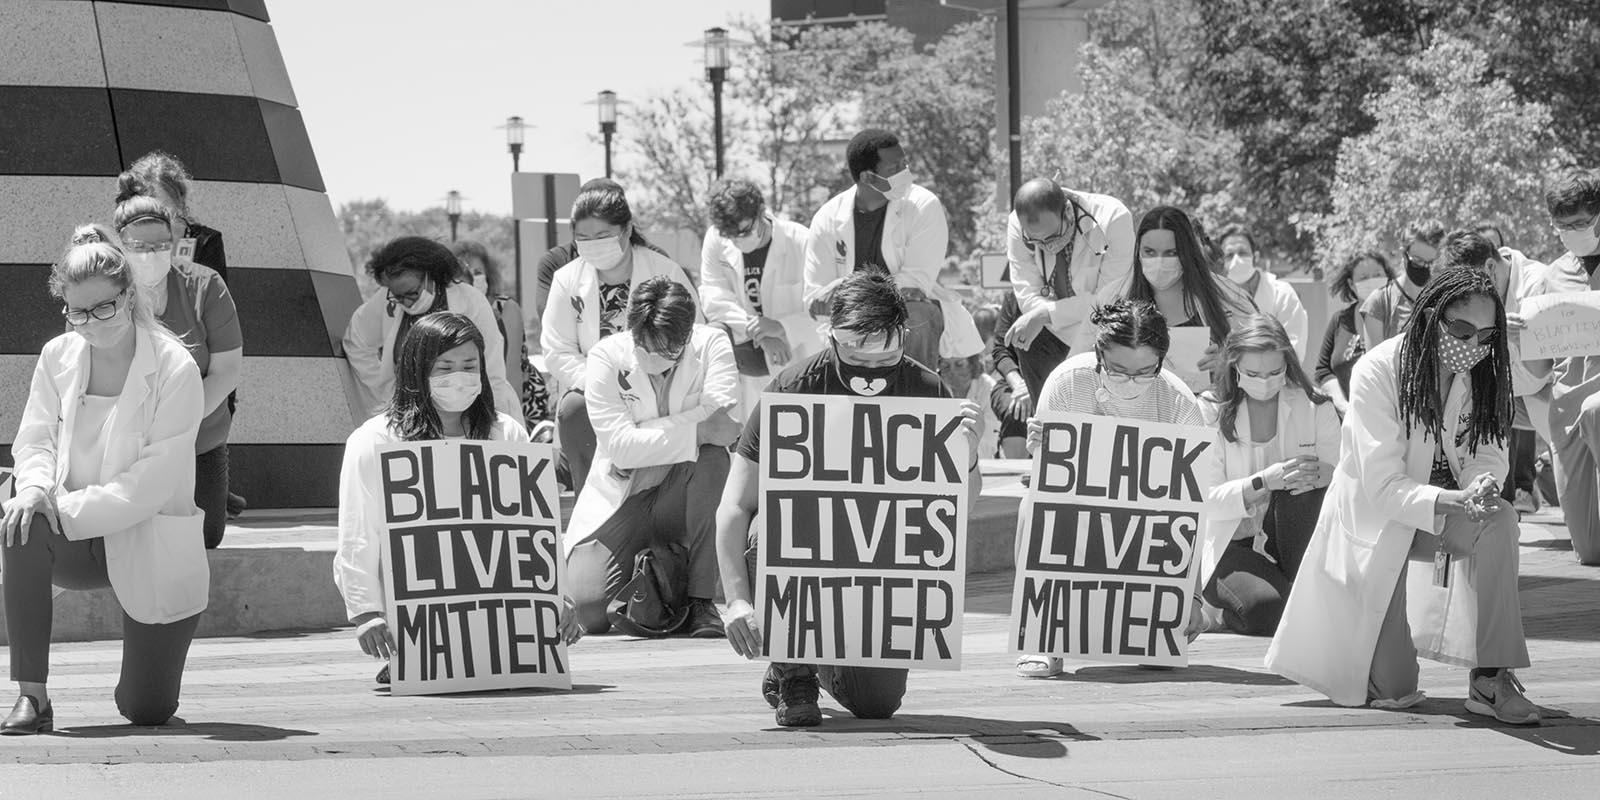 Black Lives Matter event on UNMC's Omaha campus